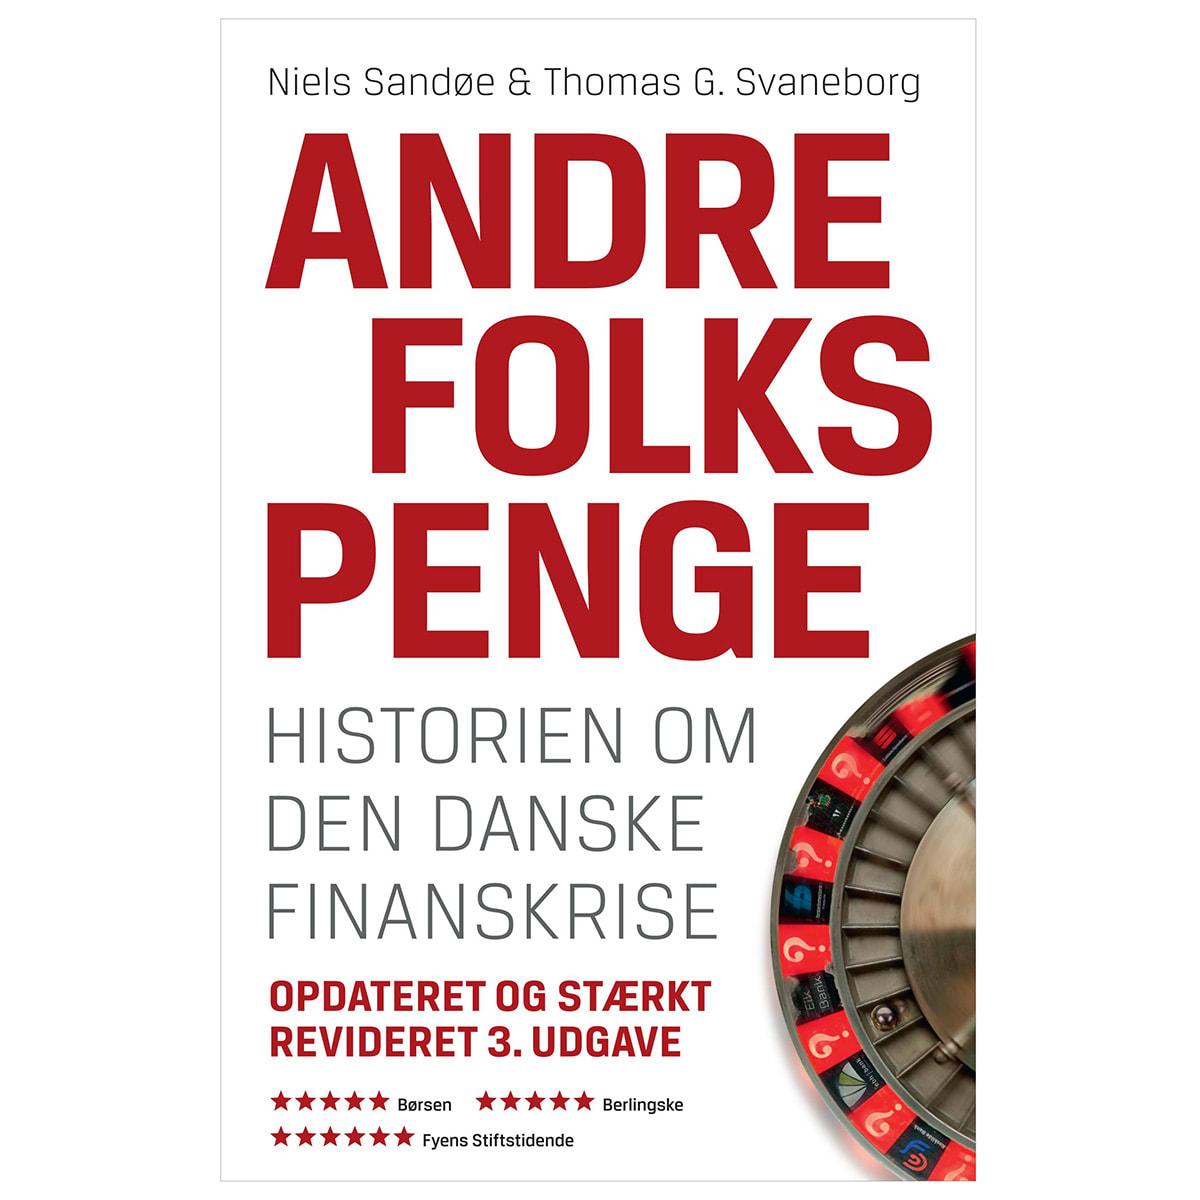 Af Thomas G. Svaneborg & Niels Sandøe